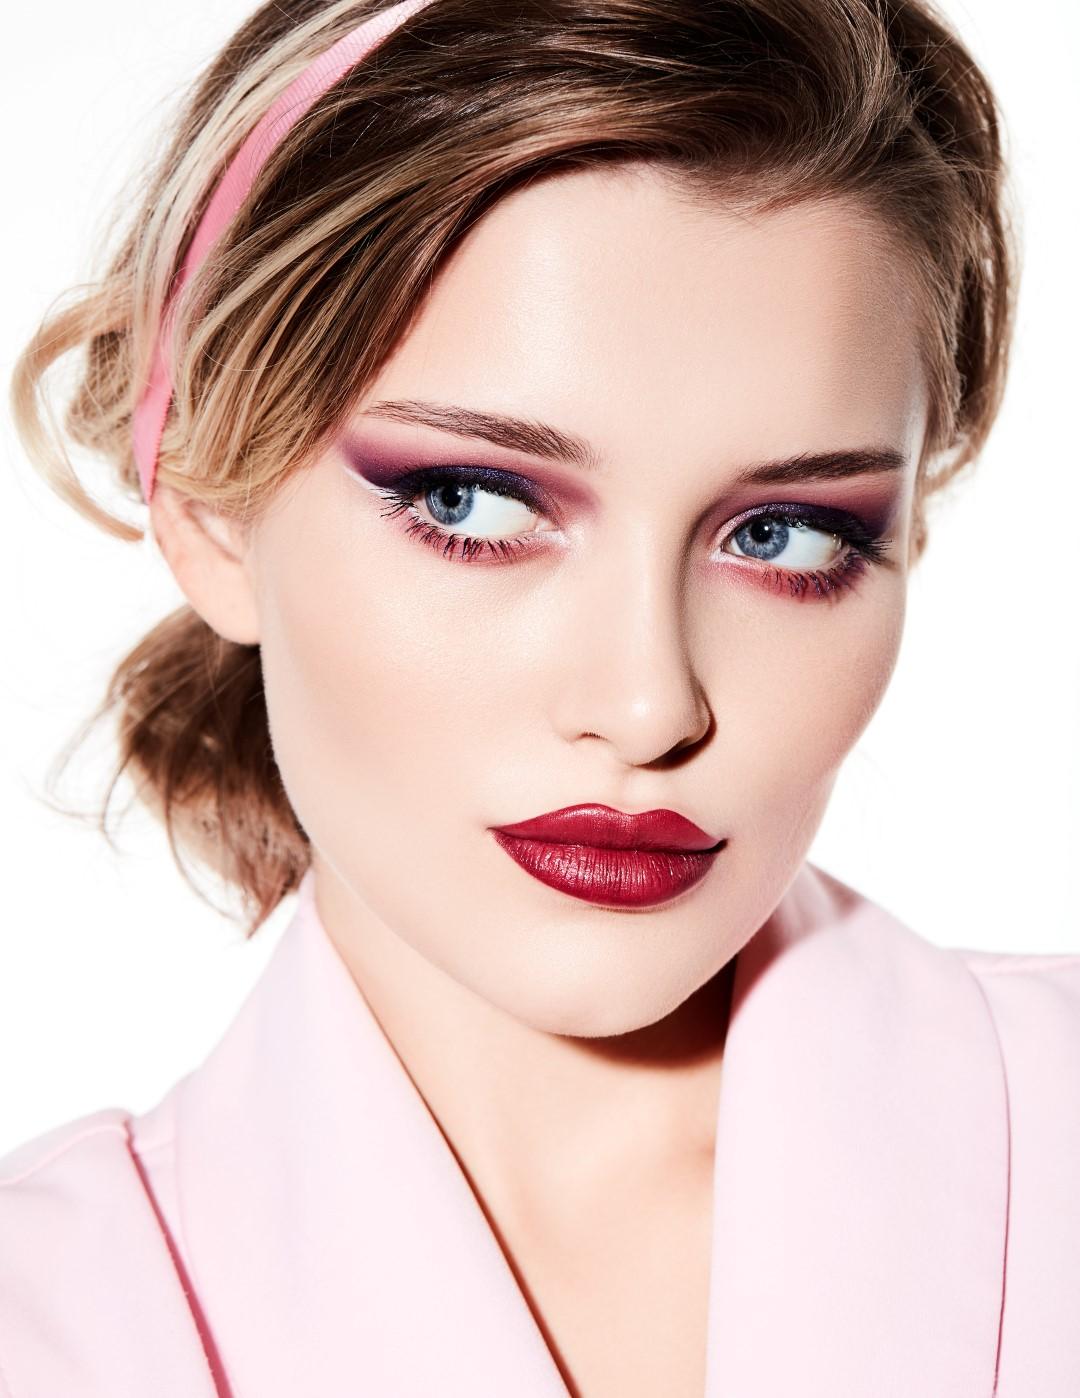 Визажист хомякова, ирина хомякова, Школа макияжа, курсы макияжа, мейкакп сопровождение, топ визажист